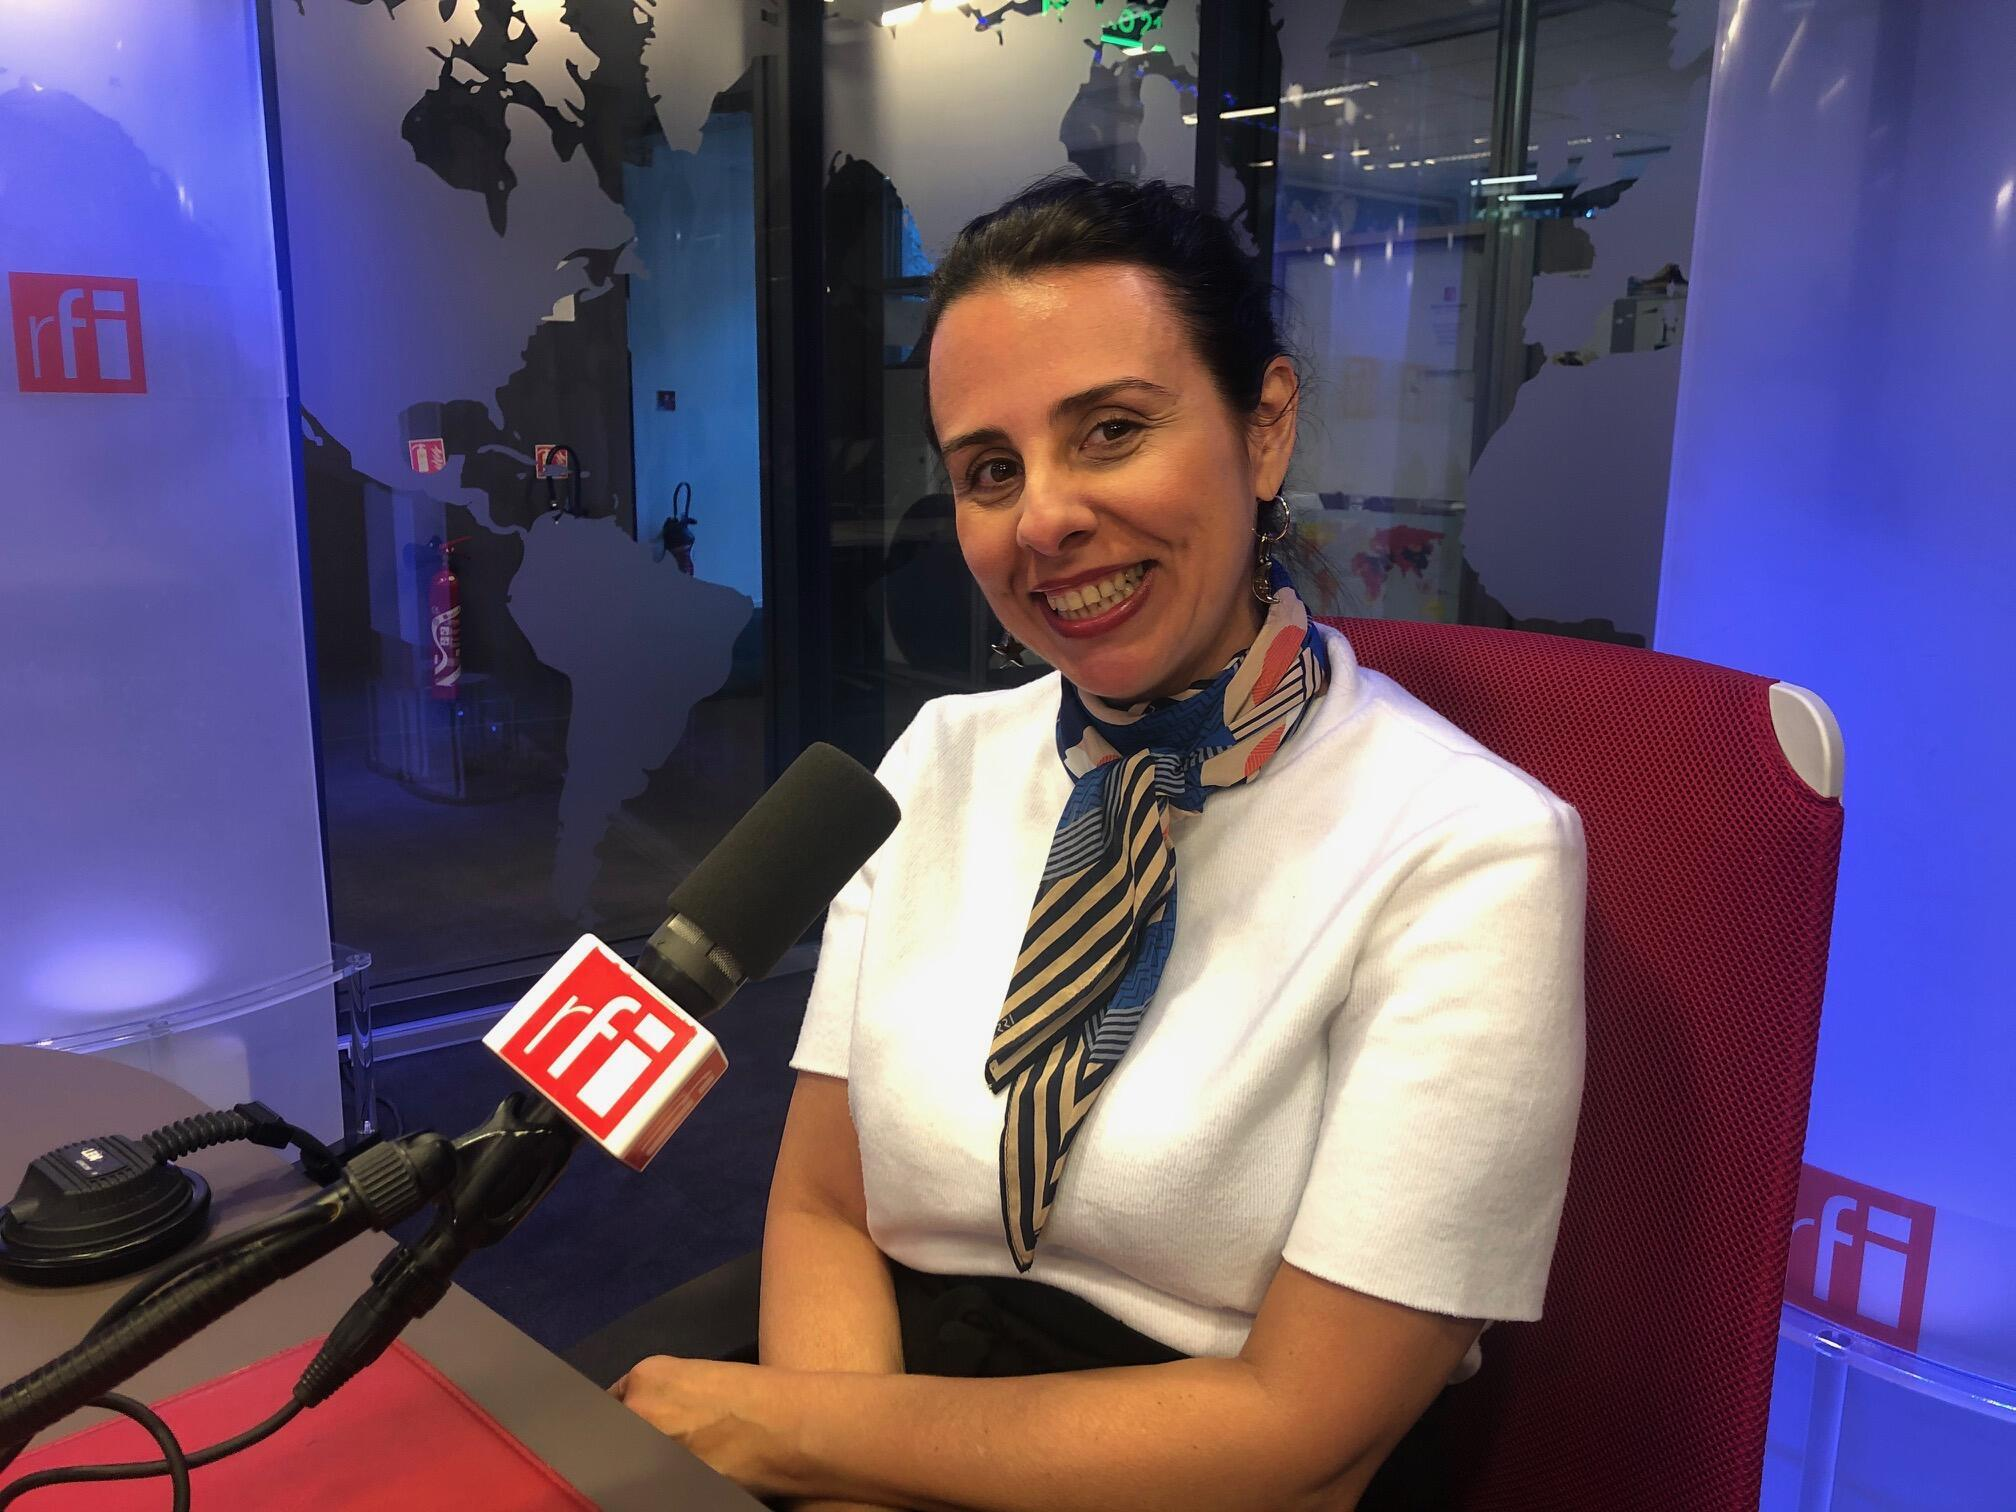 Jornalista, escritora, consultora de imagem e terapeuta holística Helen Pomposelli